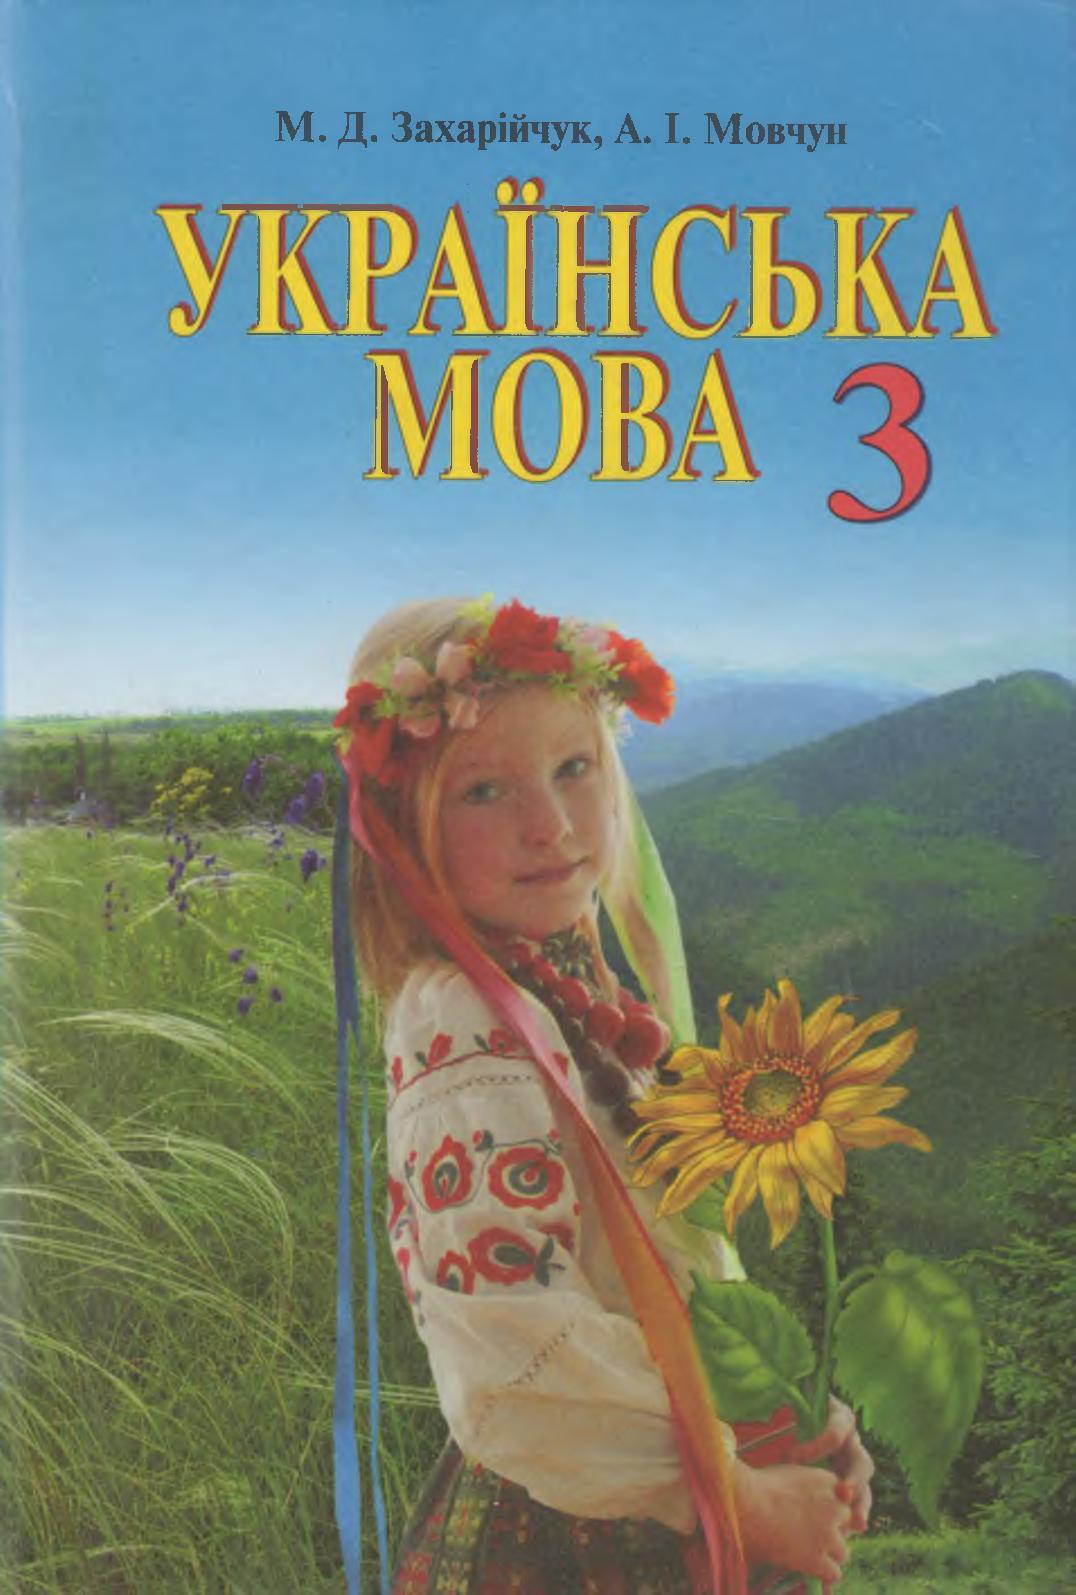 Calaméo - У Захарійчук, Мовчун 4f8624bbf09